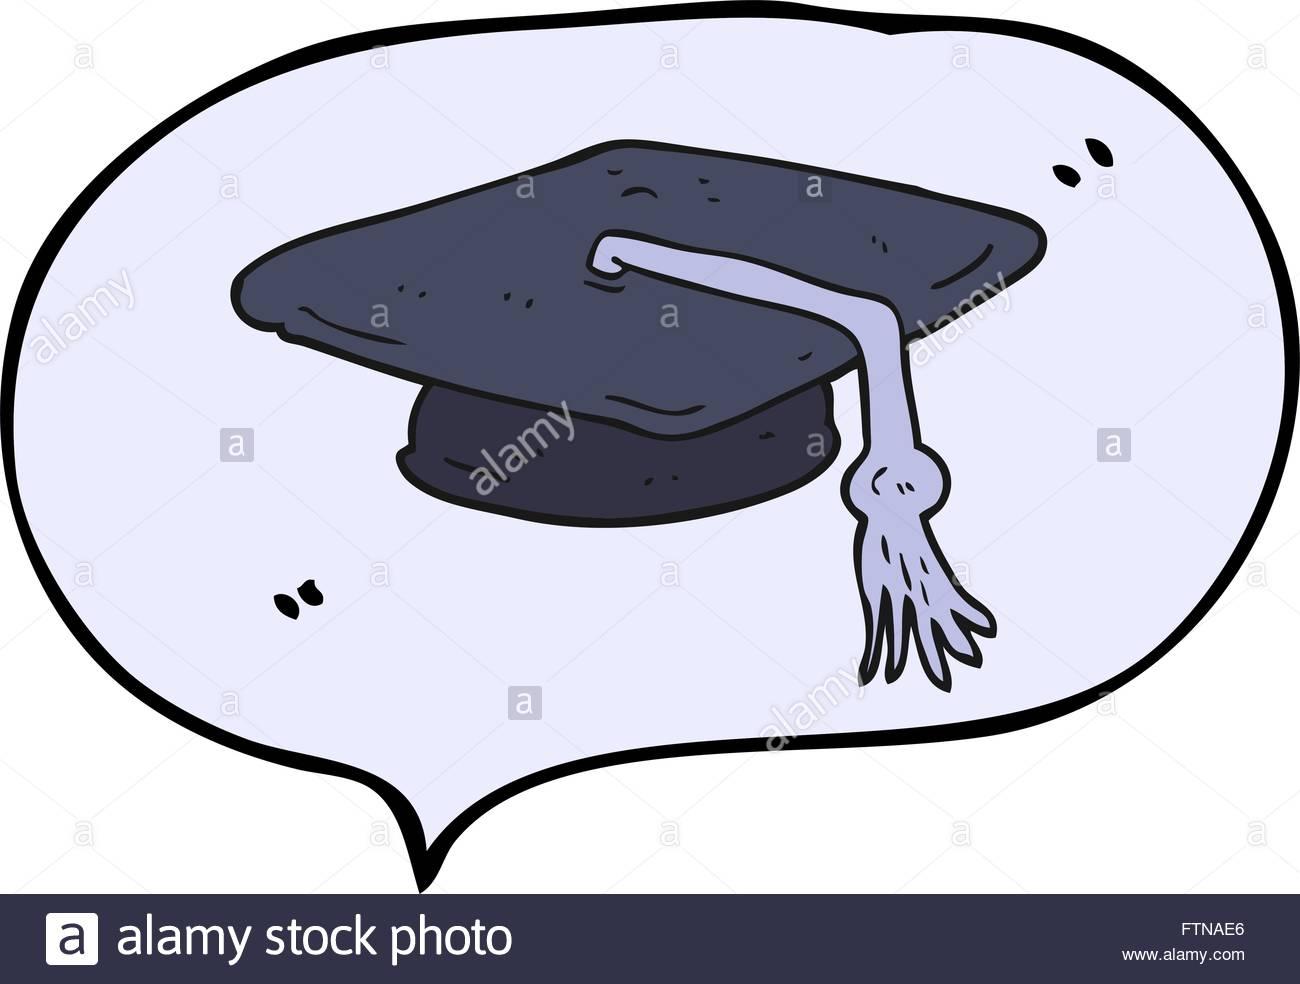 1300x984 Freehand Drawn Speech Bubble Cartoon Graduation Cap Stock Vector